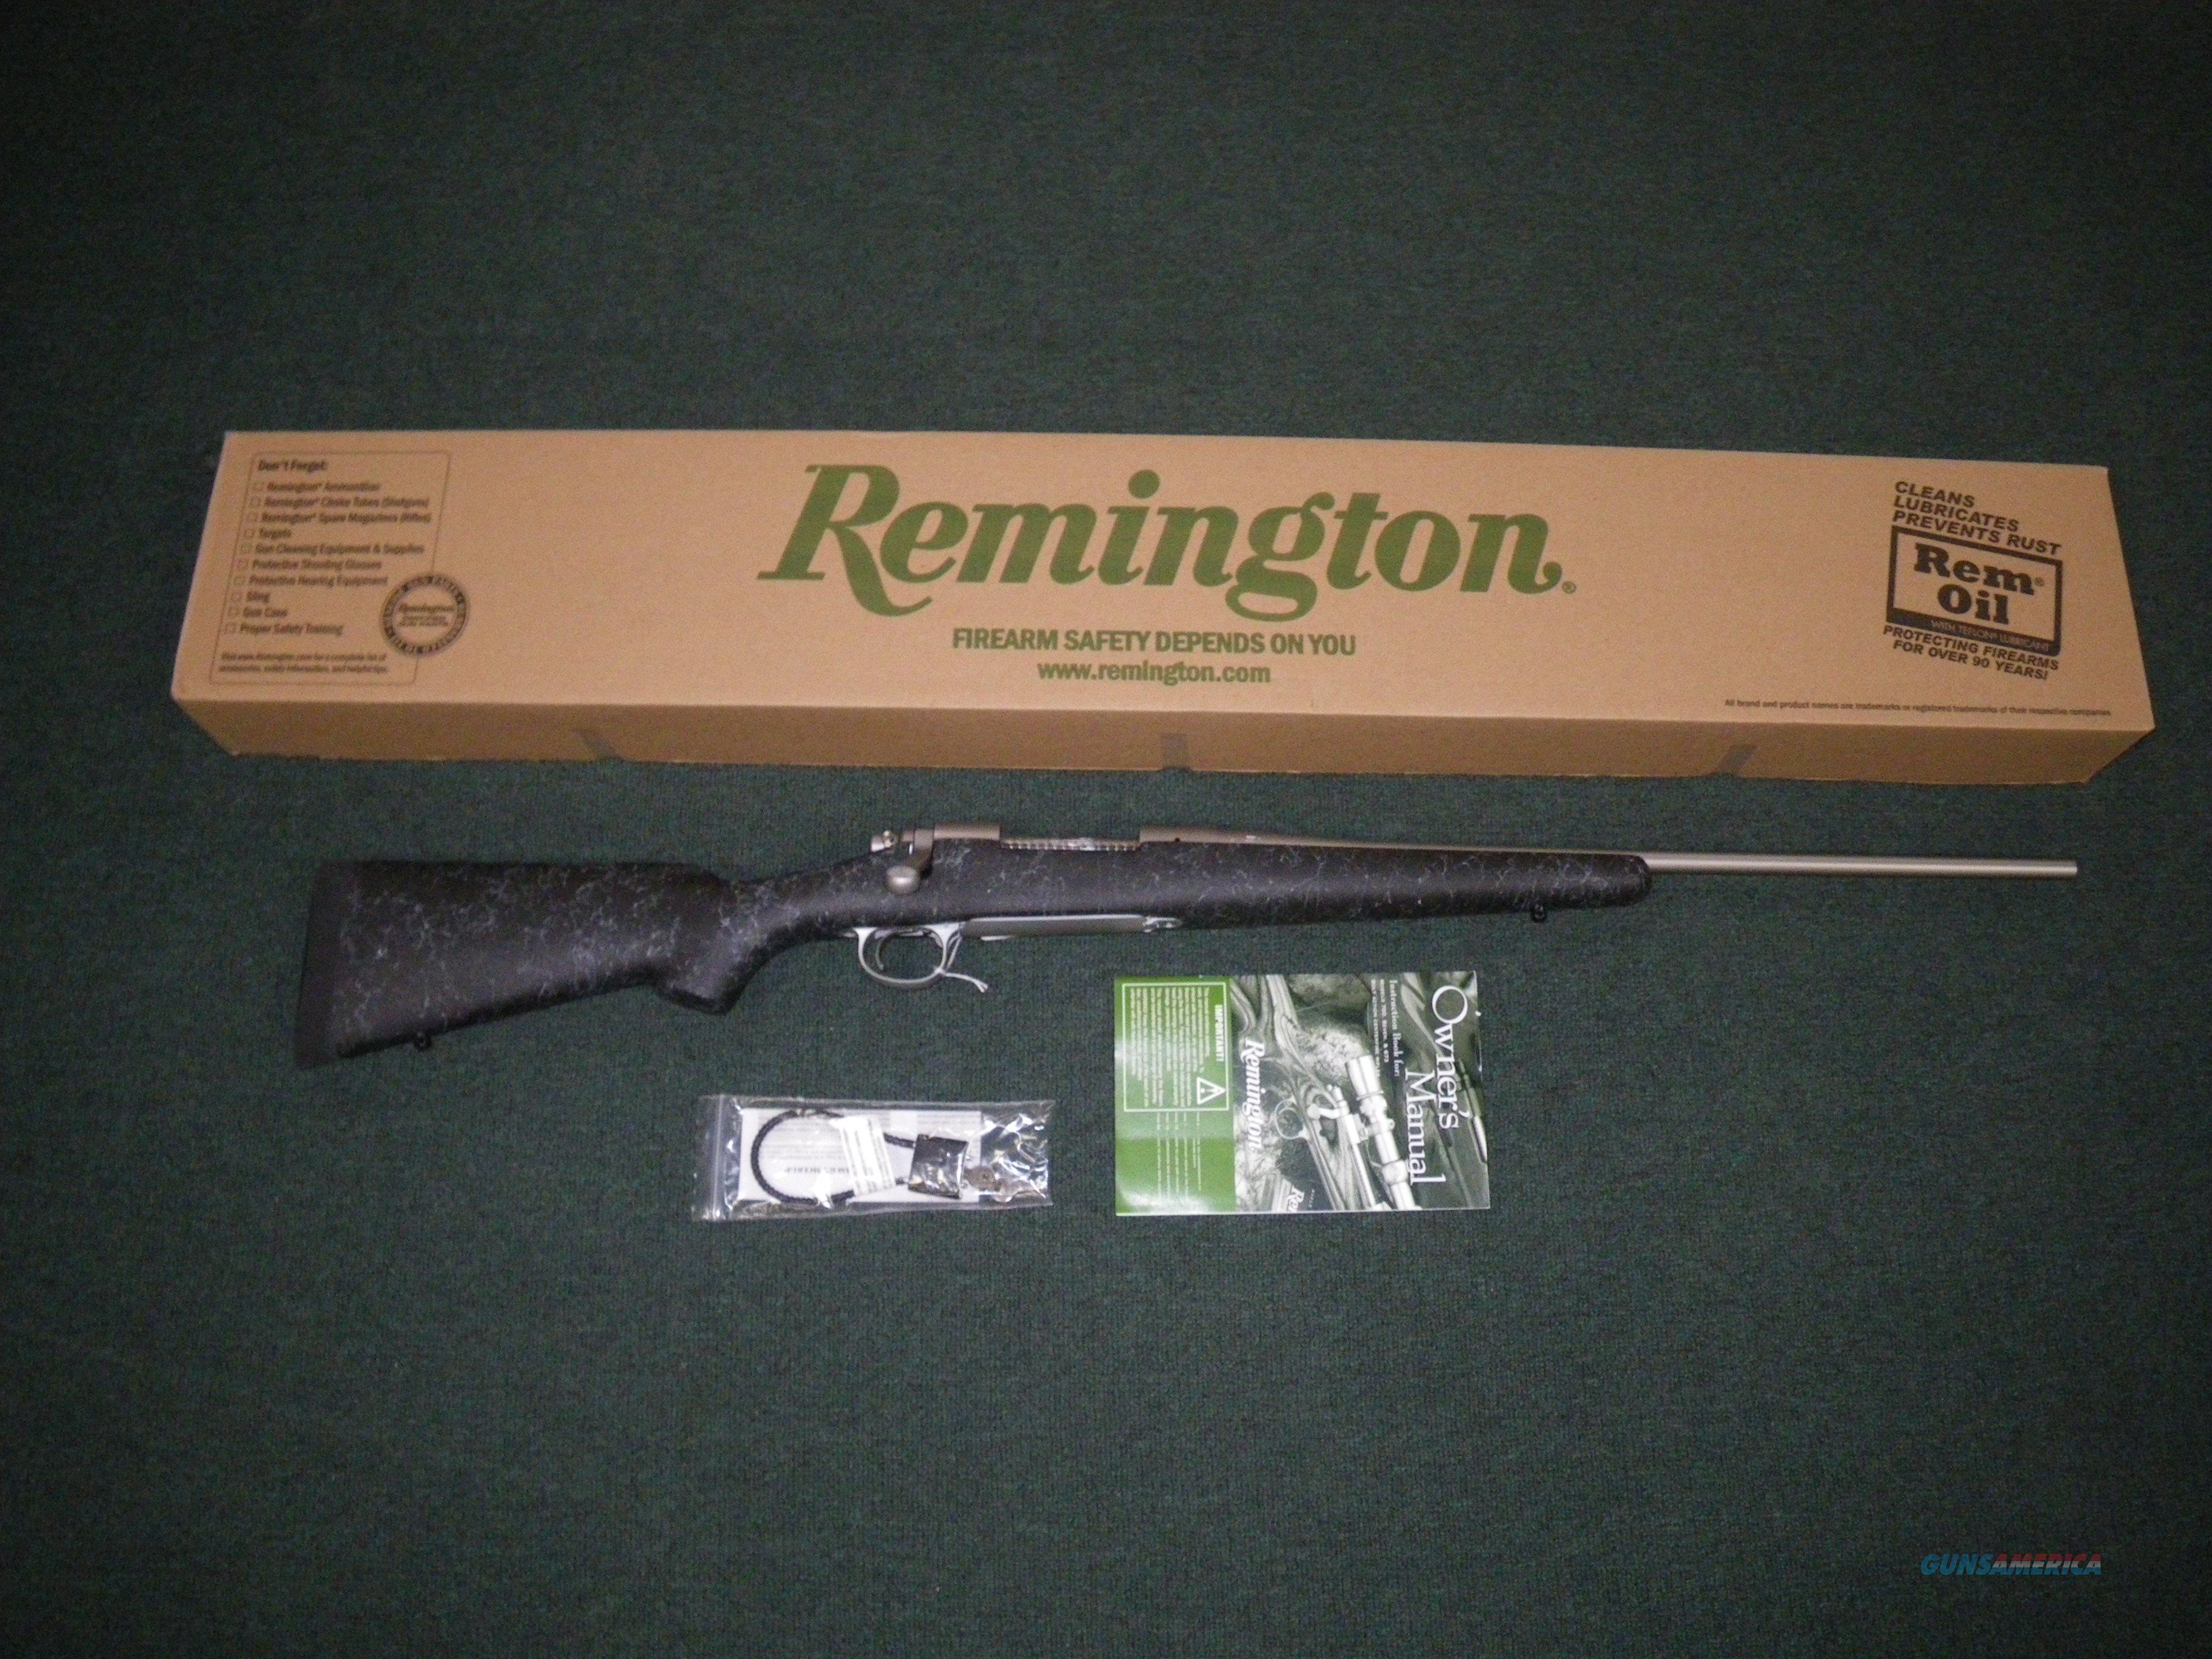 "Remington 700 Mountain Stainless 30-06 Spfld 22"" #84275  Guns > Rifles > Remington Rifles - Modern > Model 700 > Sporting"